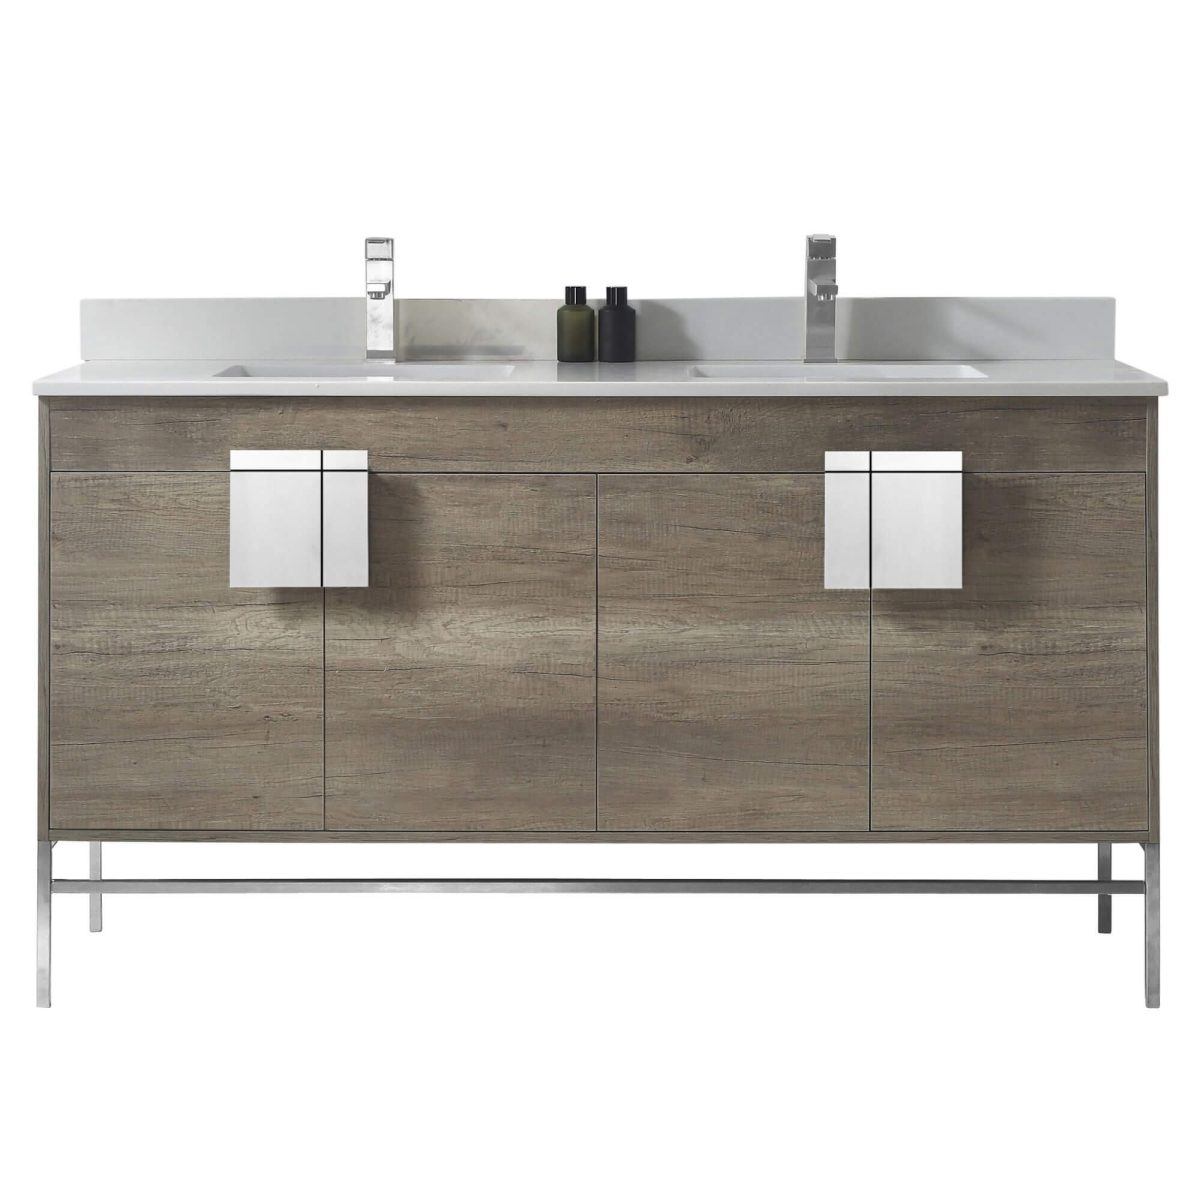 "Shawbridge 60"" Modern Double Bathroom Vanity  Shadow Gray with Polished Chrome Hardware"